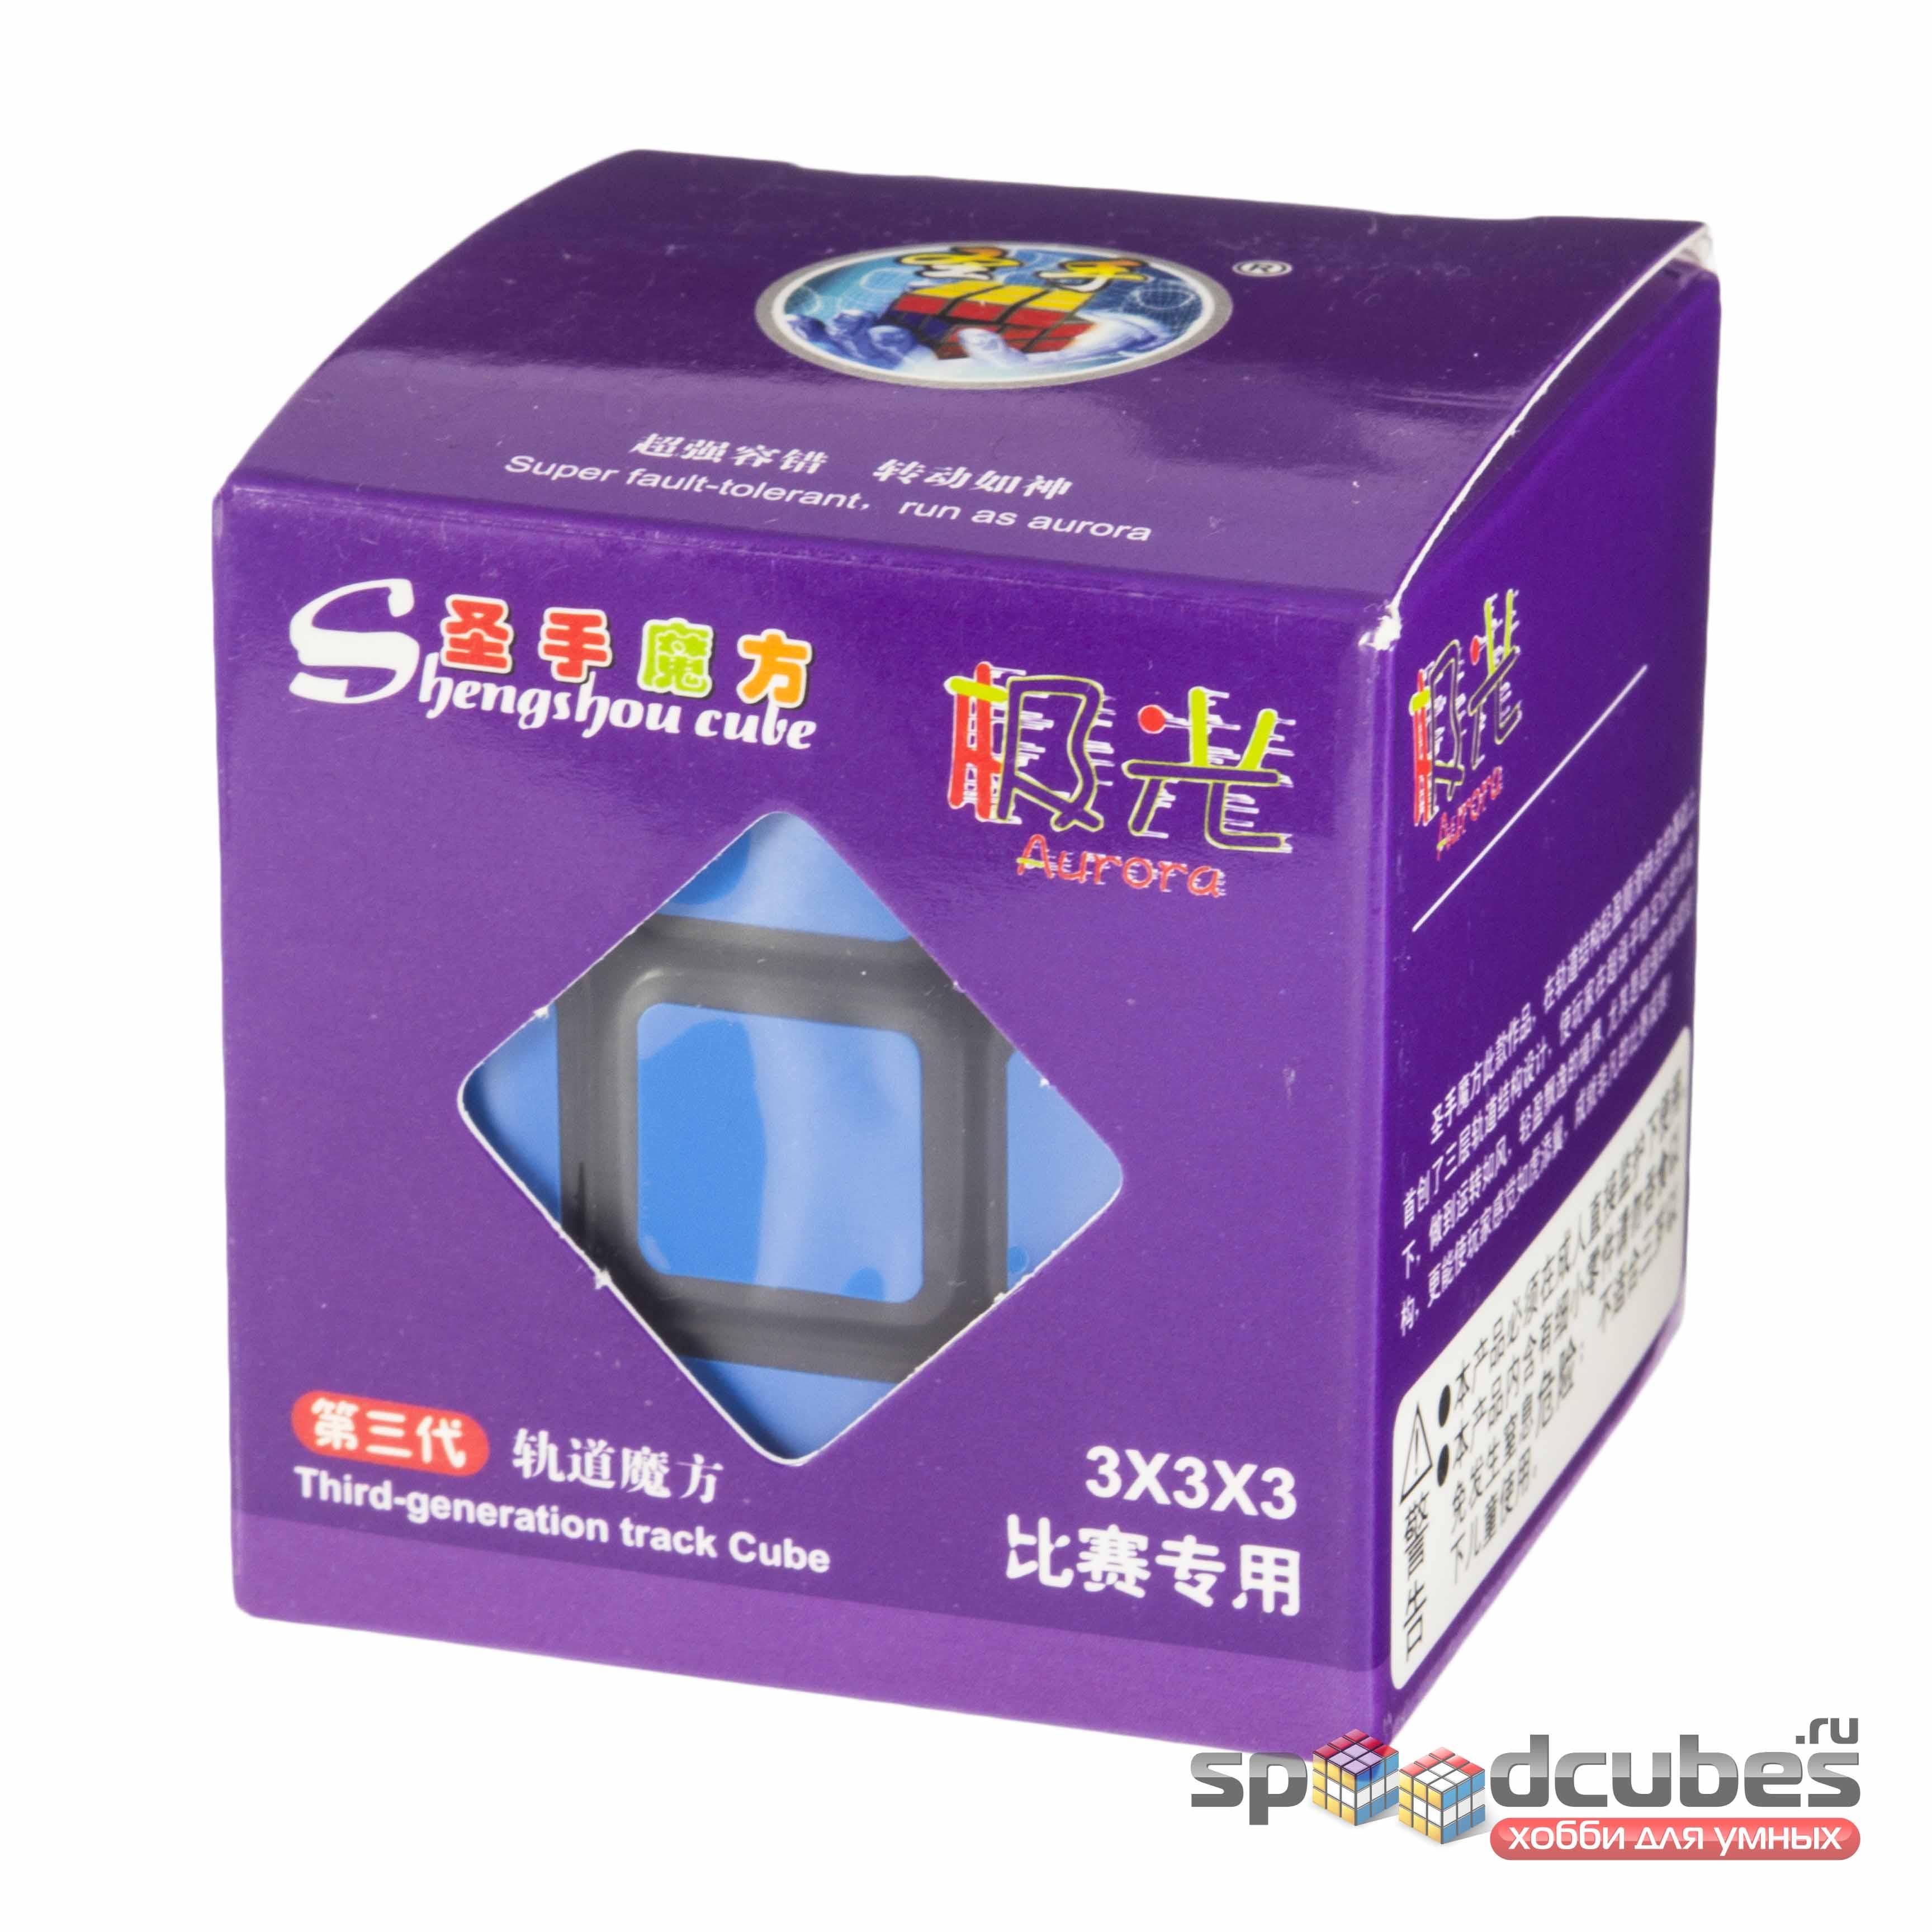 Shengshou 3x3x3 Aurora Black 1